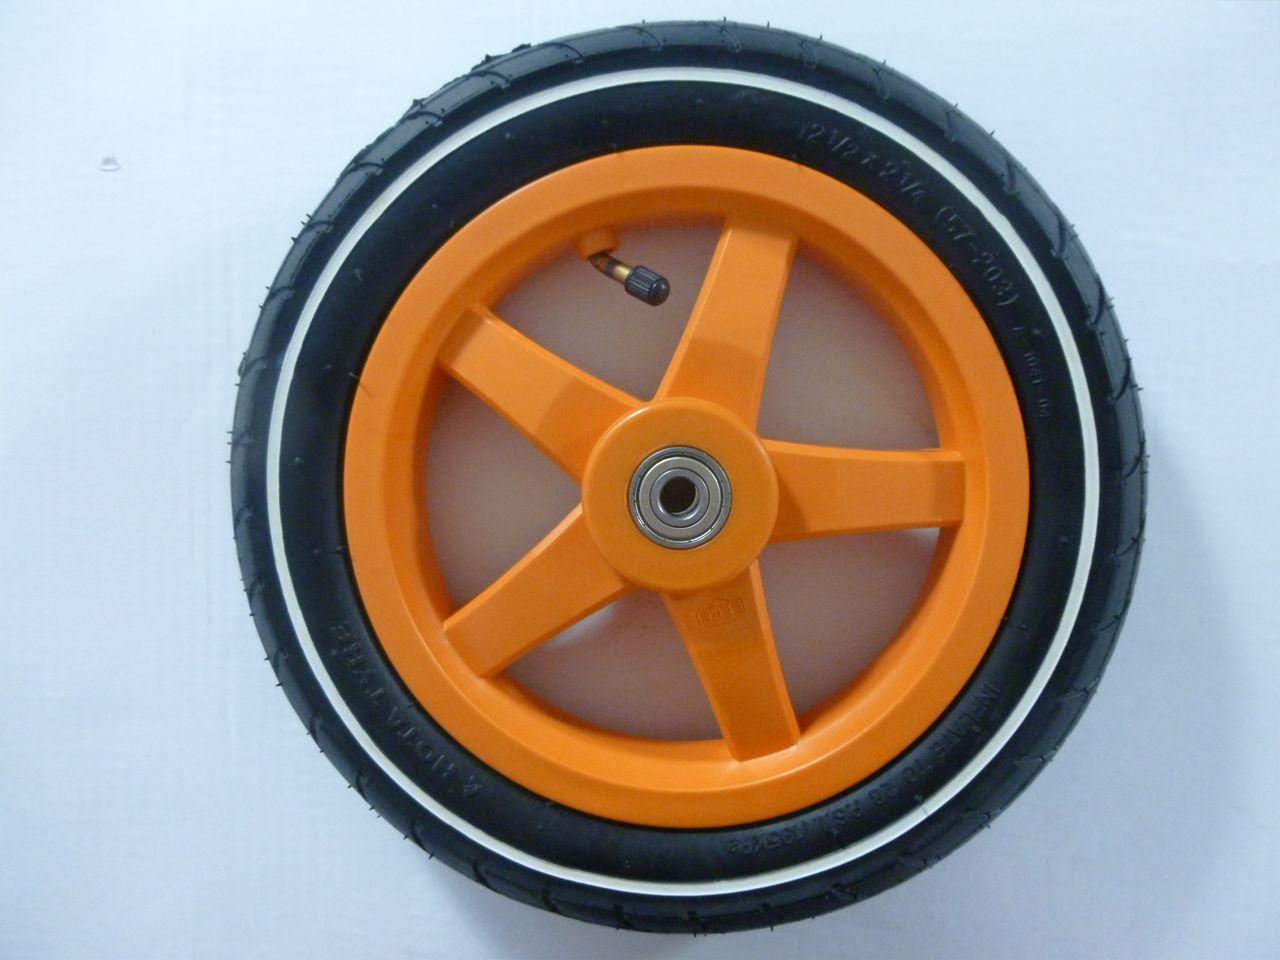 Wheel orange 12.5x2.25-8 slick (white striping)